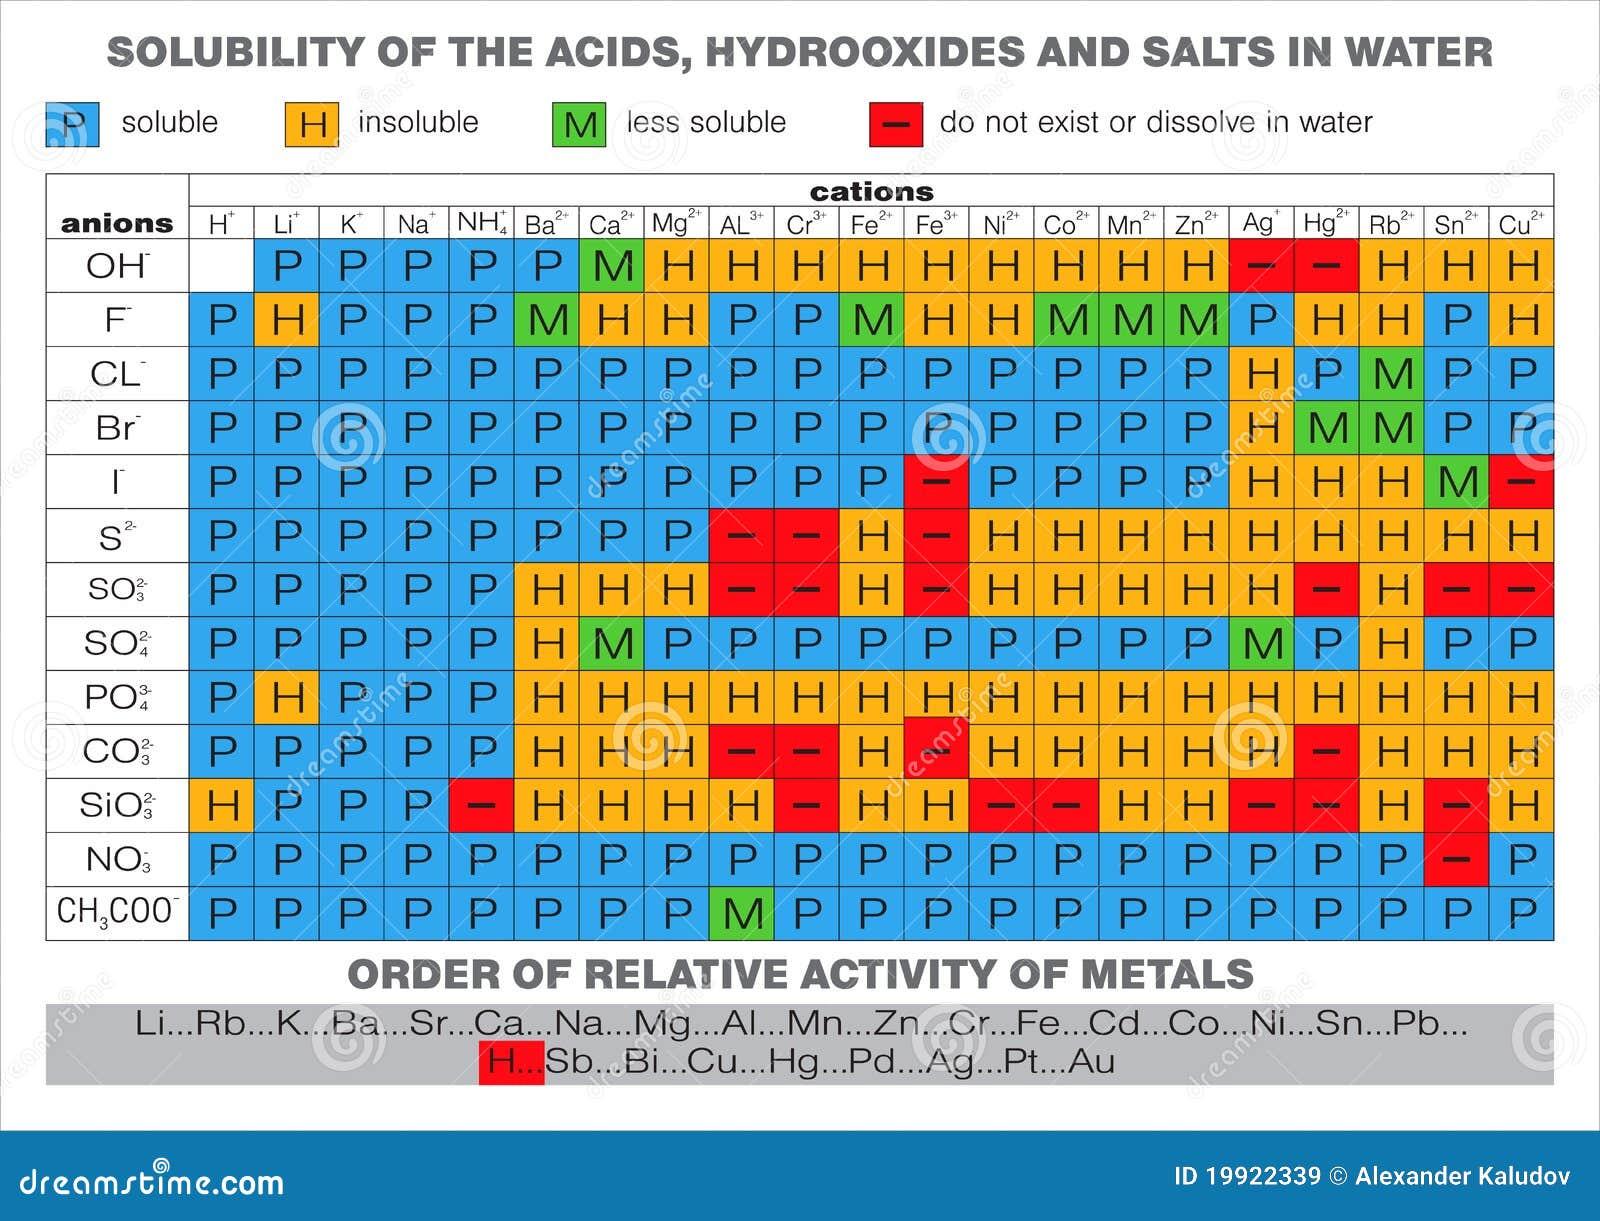 Western sierra collegiate academy httpthumbsdreamstimezsolubility water table 19922339g fandeluxe Choice Image